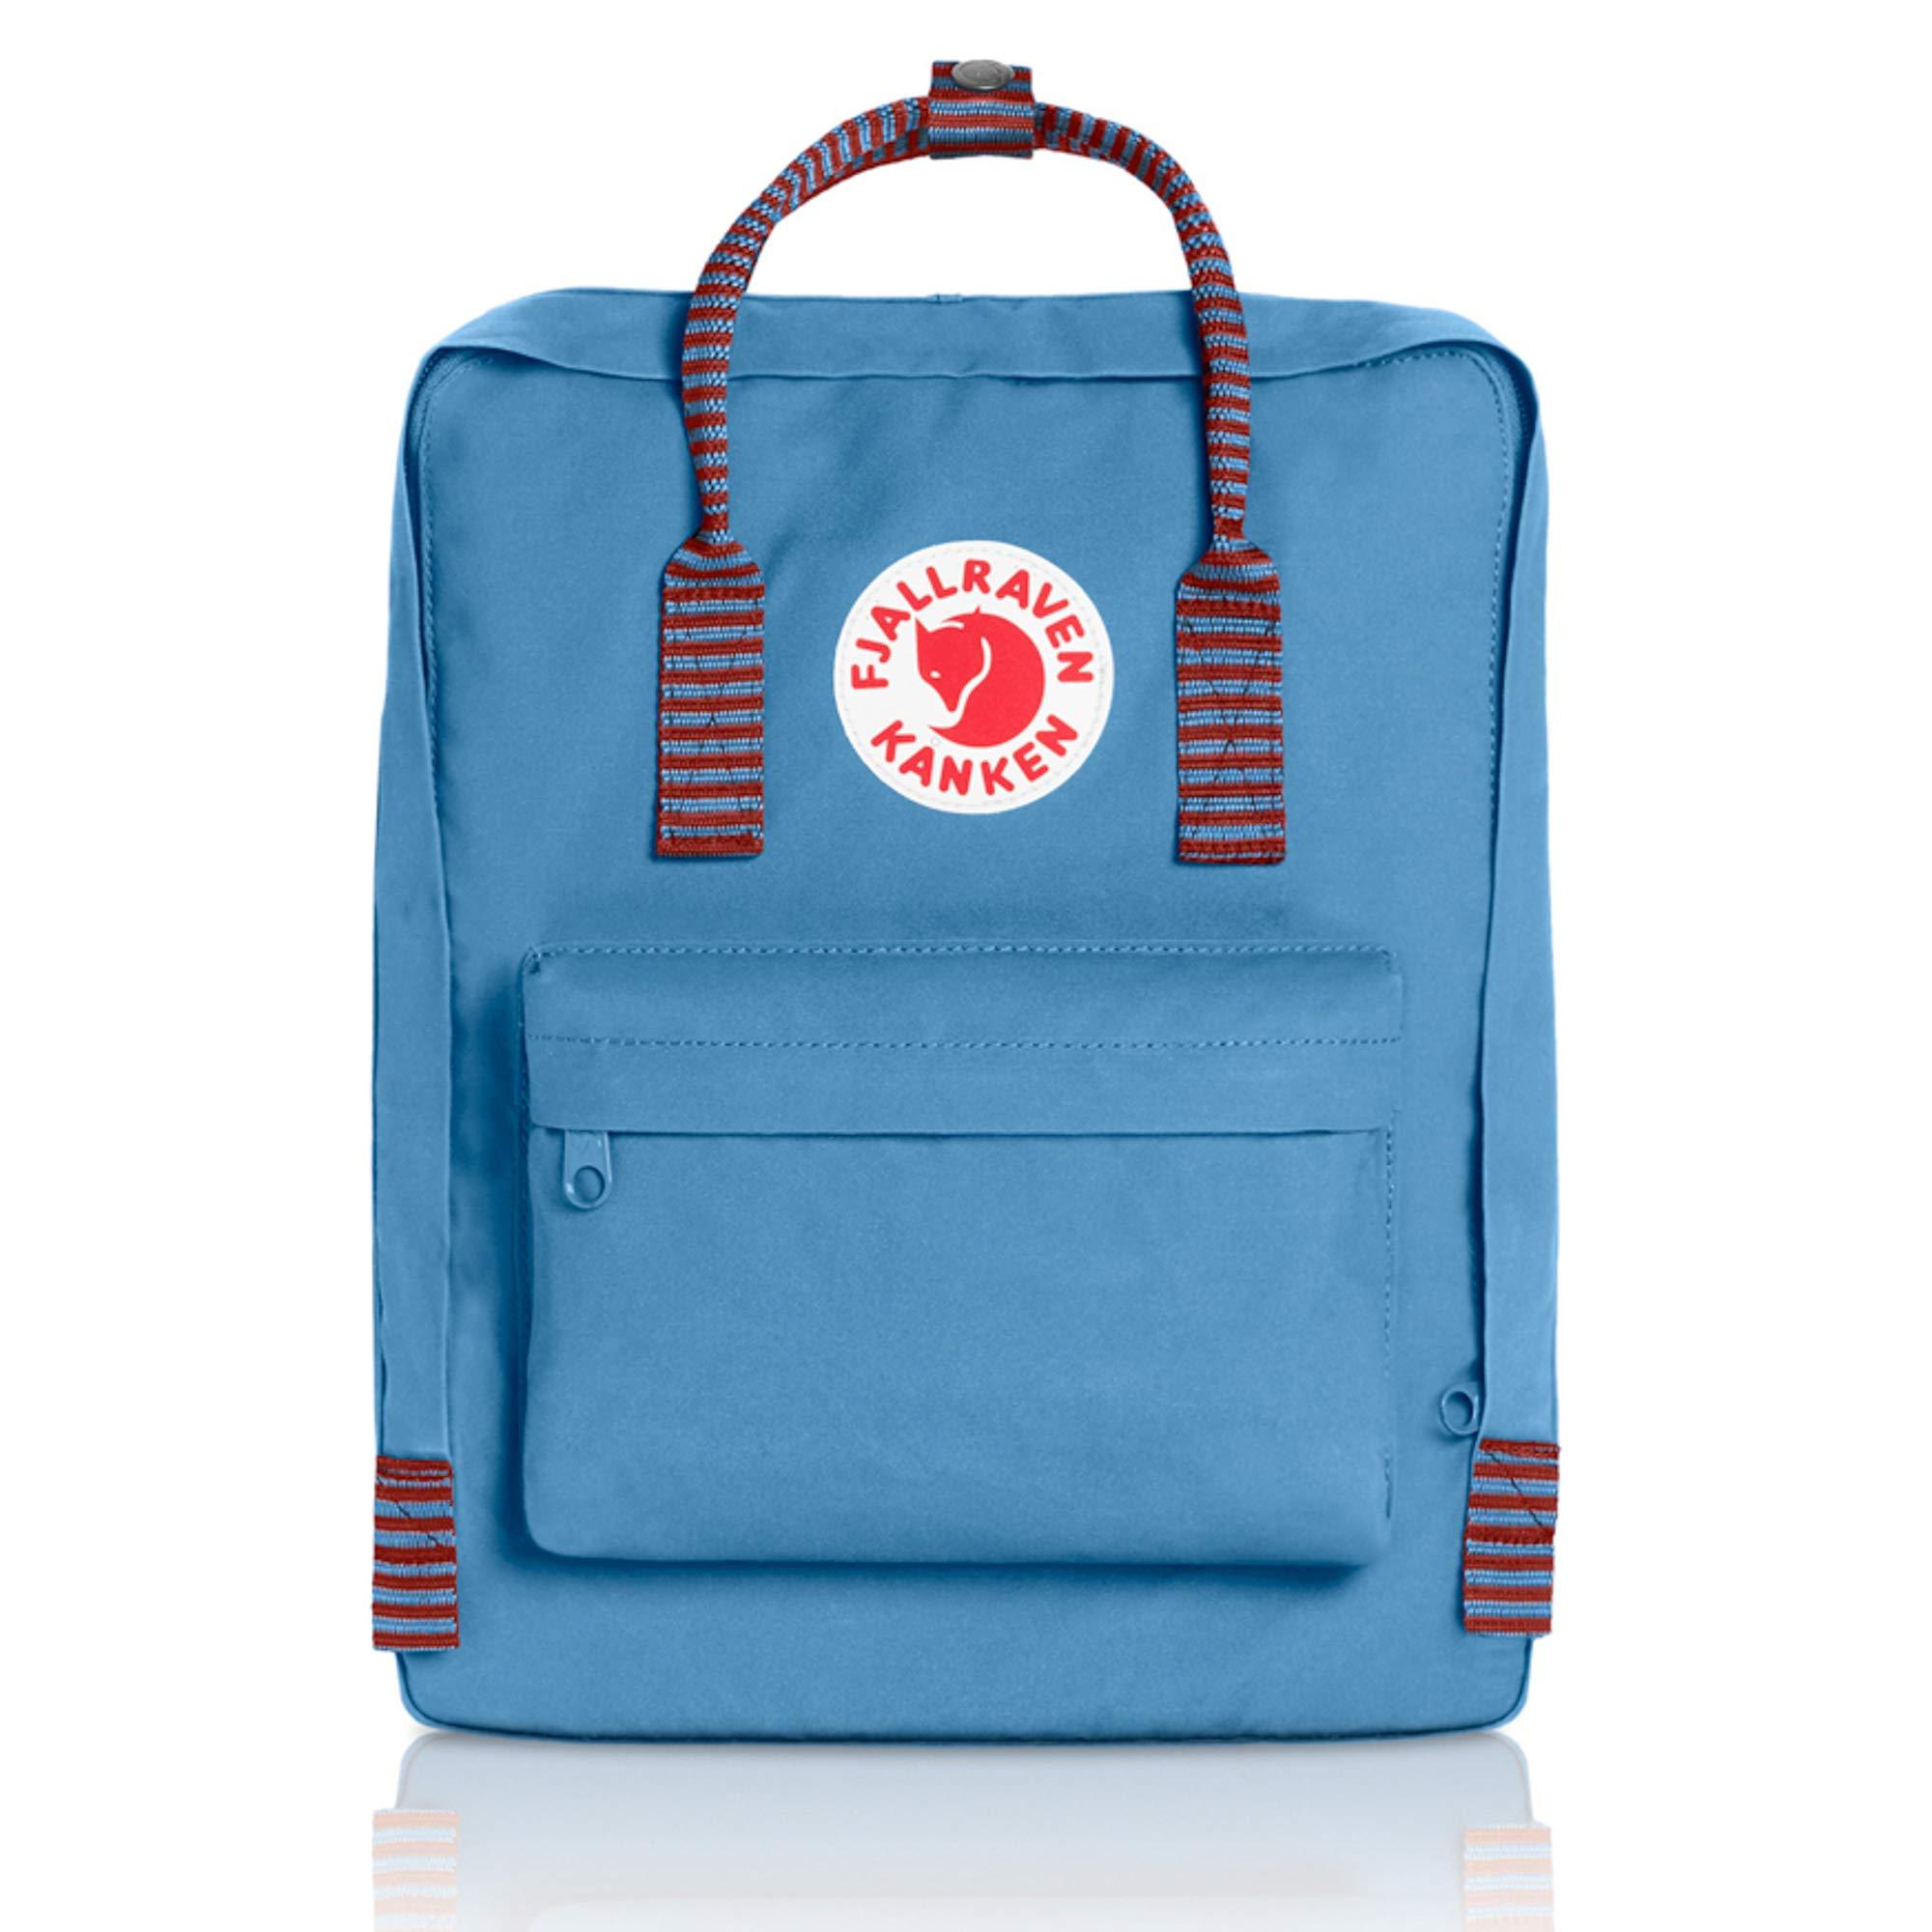 Fjallraven - Kanken Classic Backpack for Everyday, Air Blue-Striped